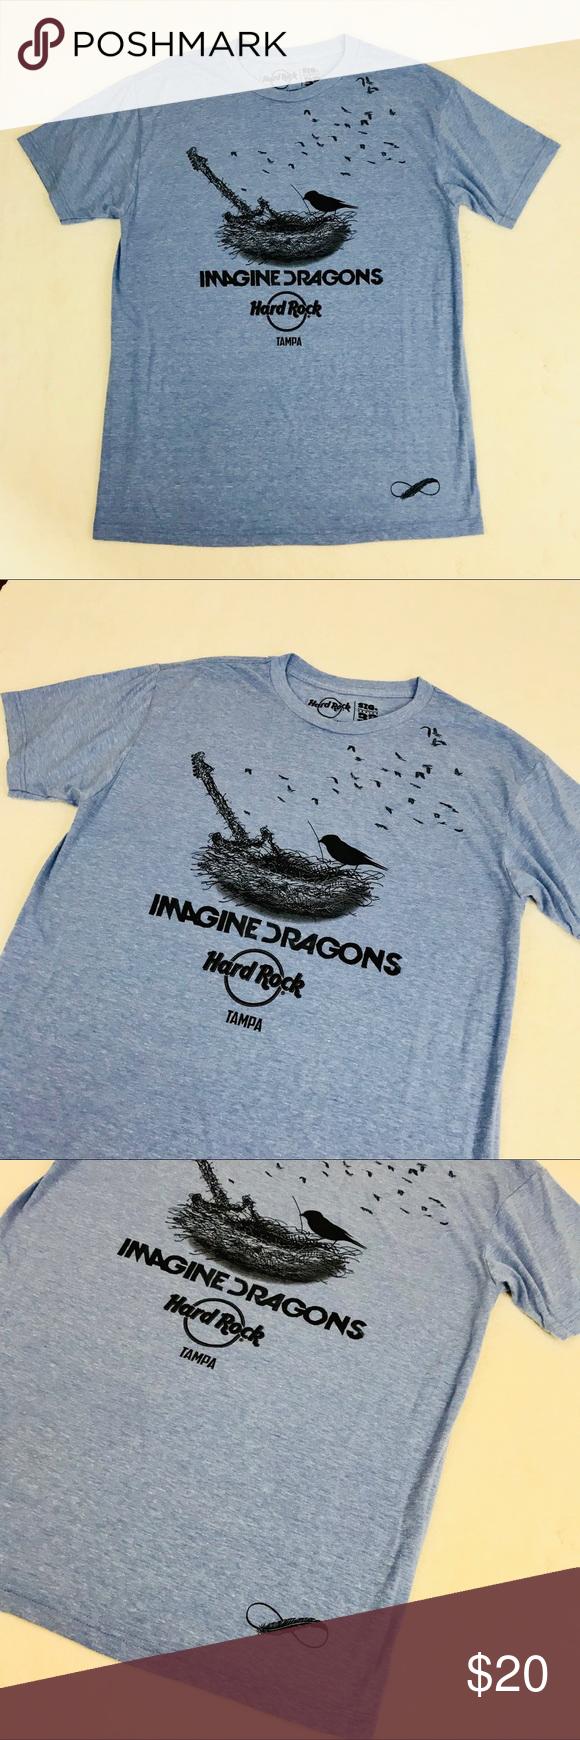 ee3b70e2c6a6 Imagine Dragons Hard Rock Cafe Tampa T-Shirt L NEW Imagine Dragons Hard  Rock Cafe